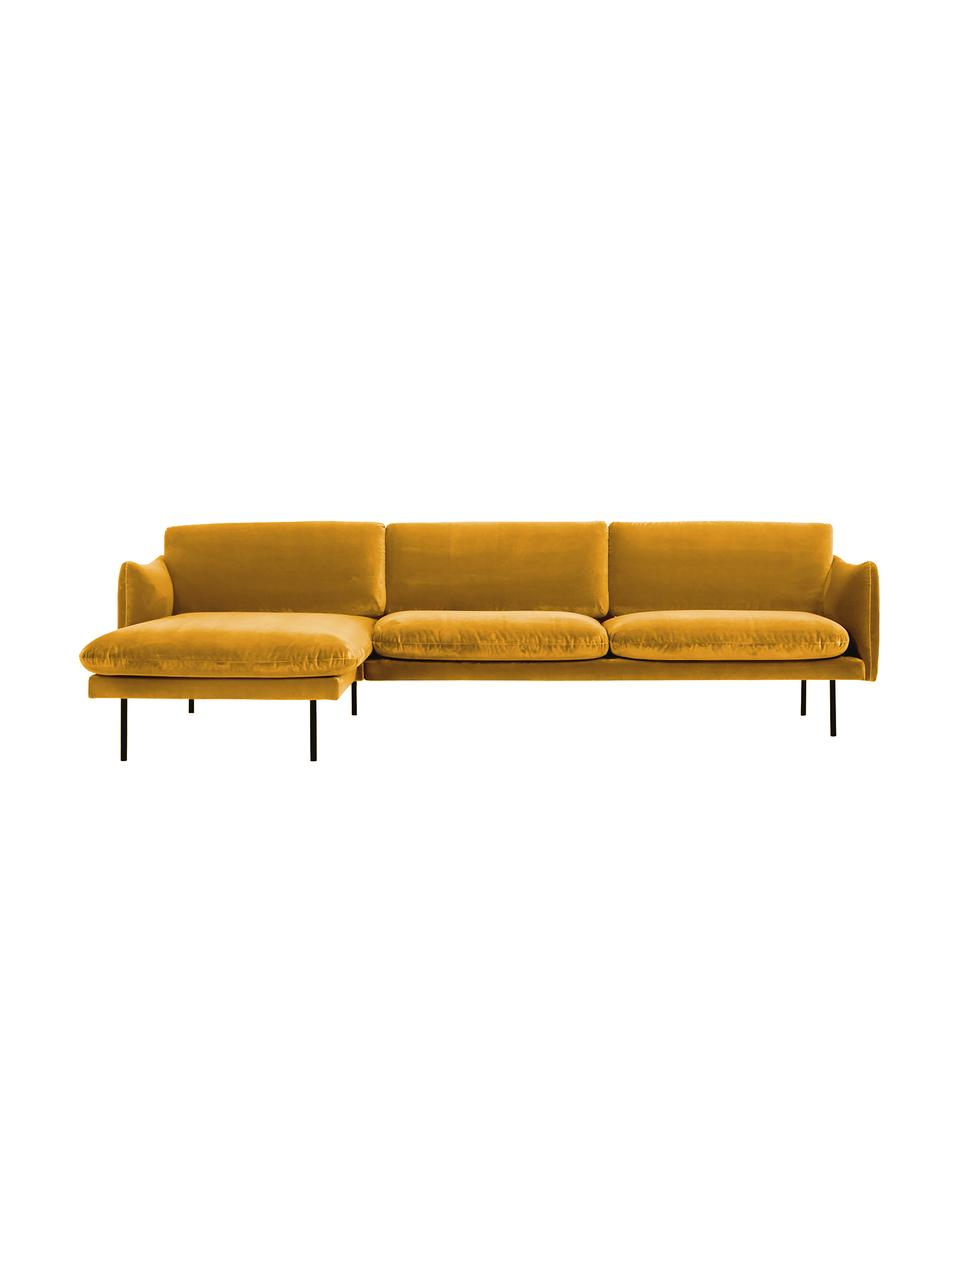 Canapé d'angle velours jaune moutarde pieds en métal Moby, Velours jaune moutarde